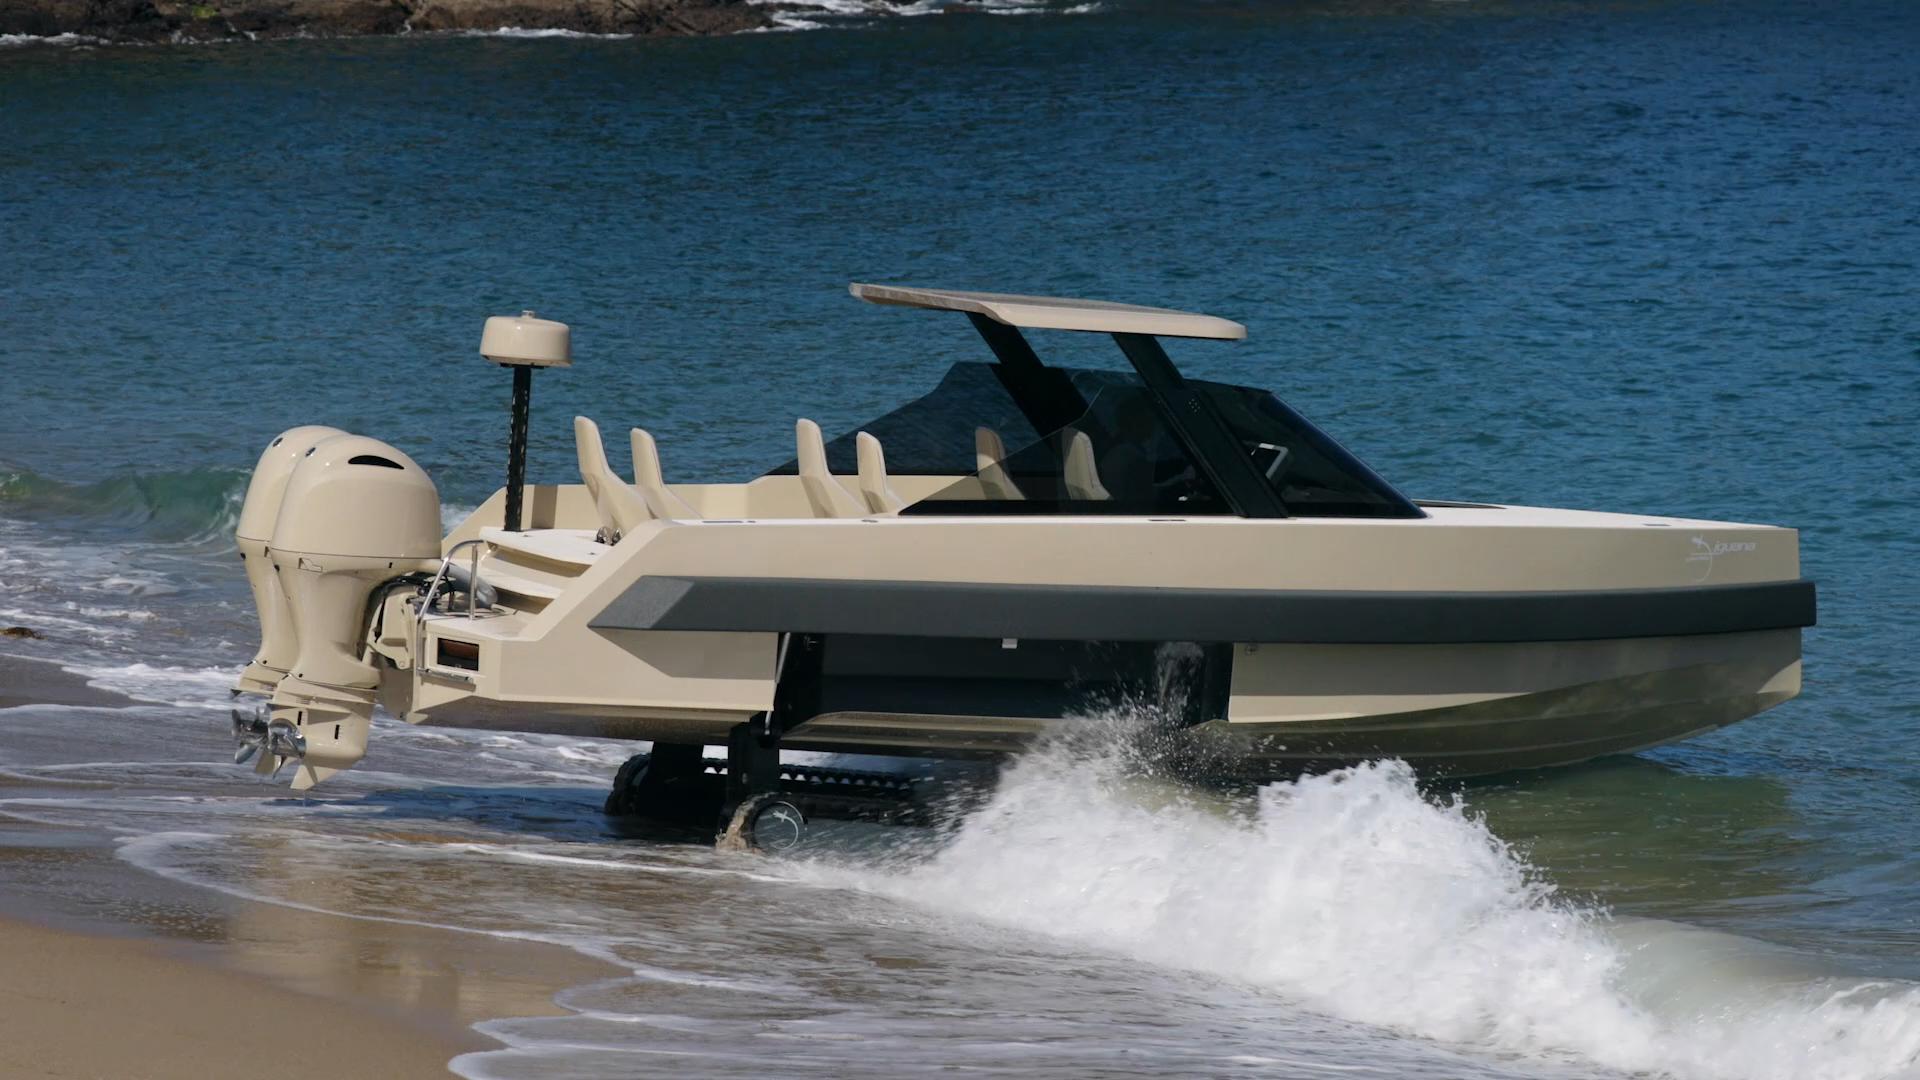 Iguana's ingenious amphibious seven-seat cabriolet taxi